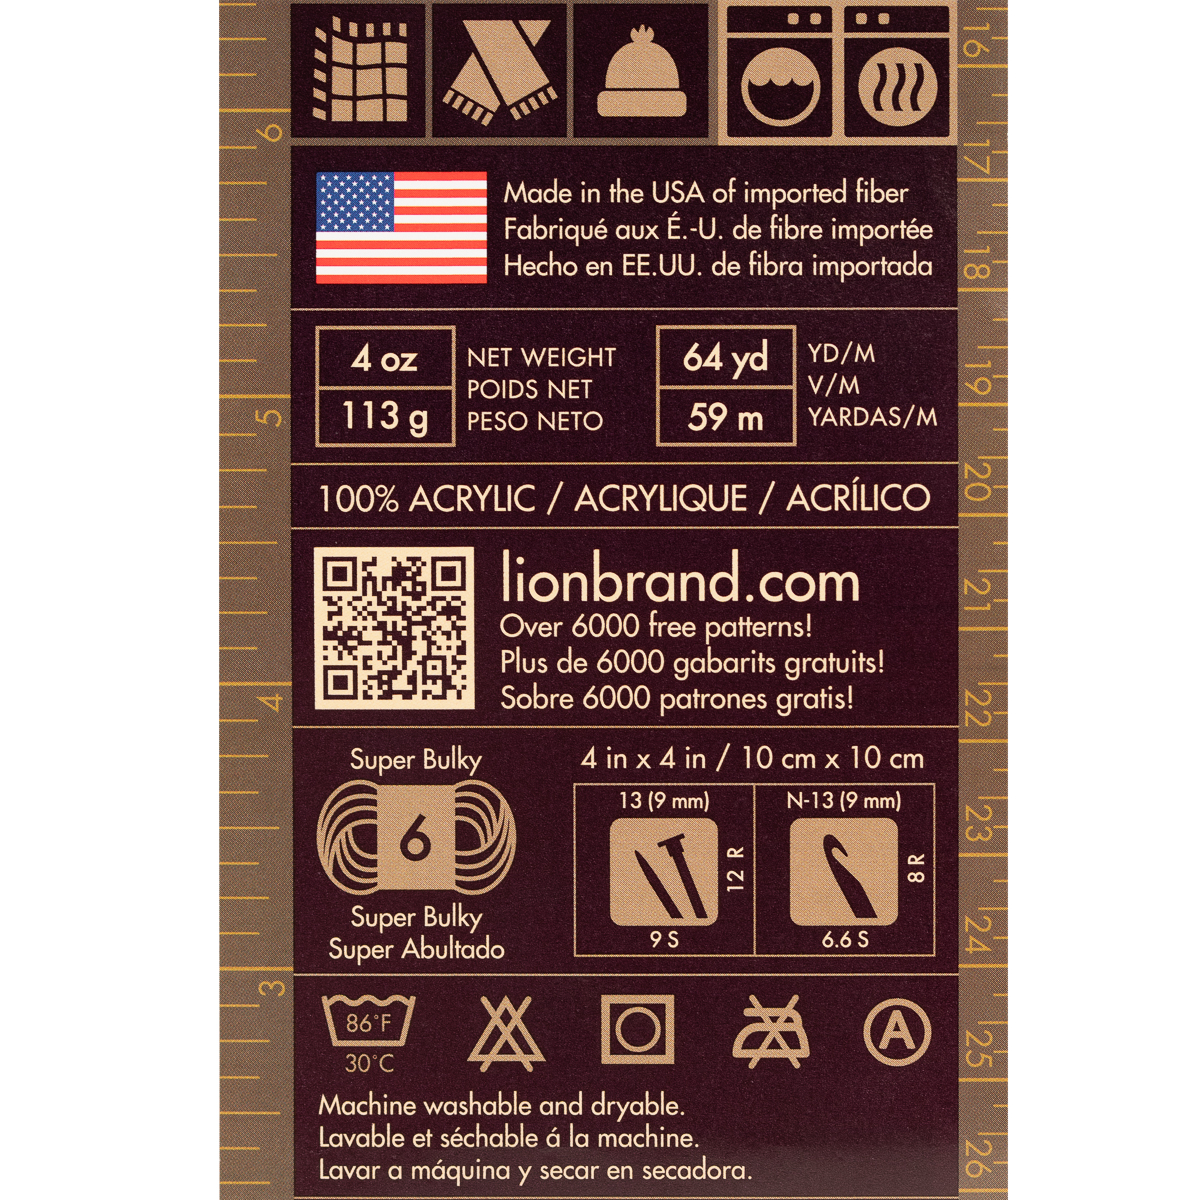 3pk-Lion-Brand-Hometown-USA-100-Acrylic-Yarn-Super-Bulky-6-Knit-Crochet-Skeins thumbnail 12